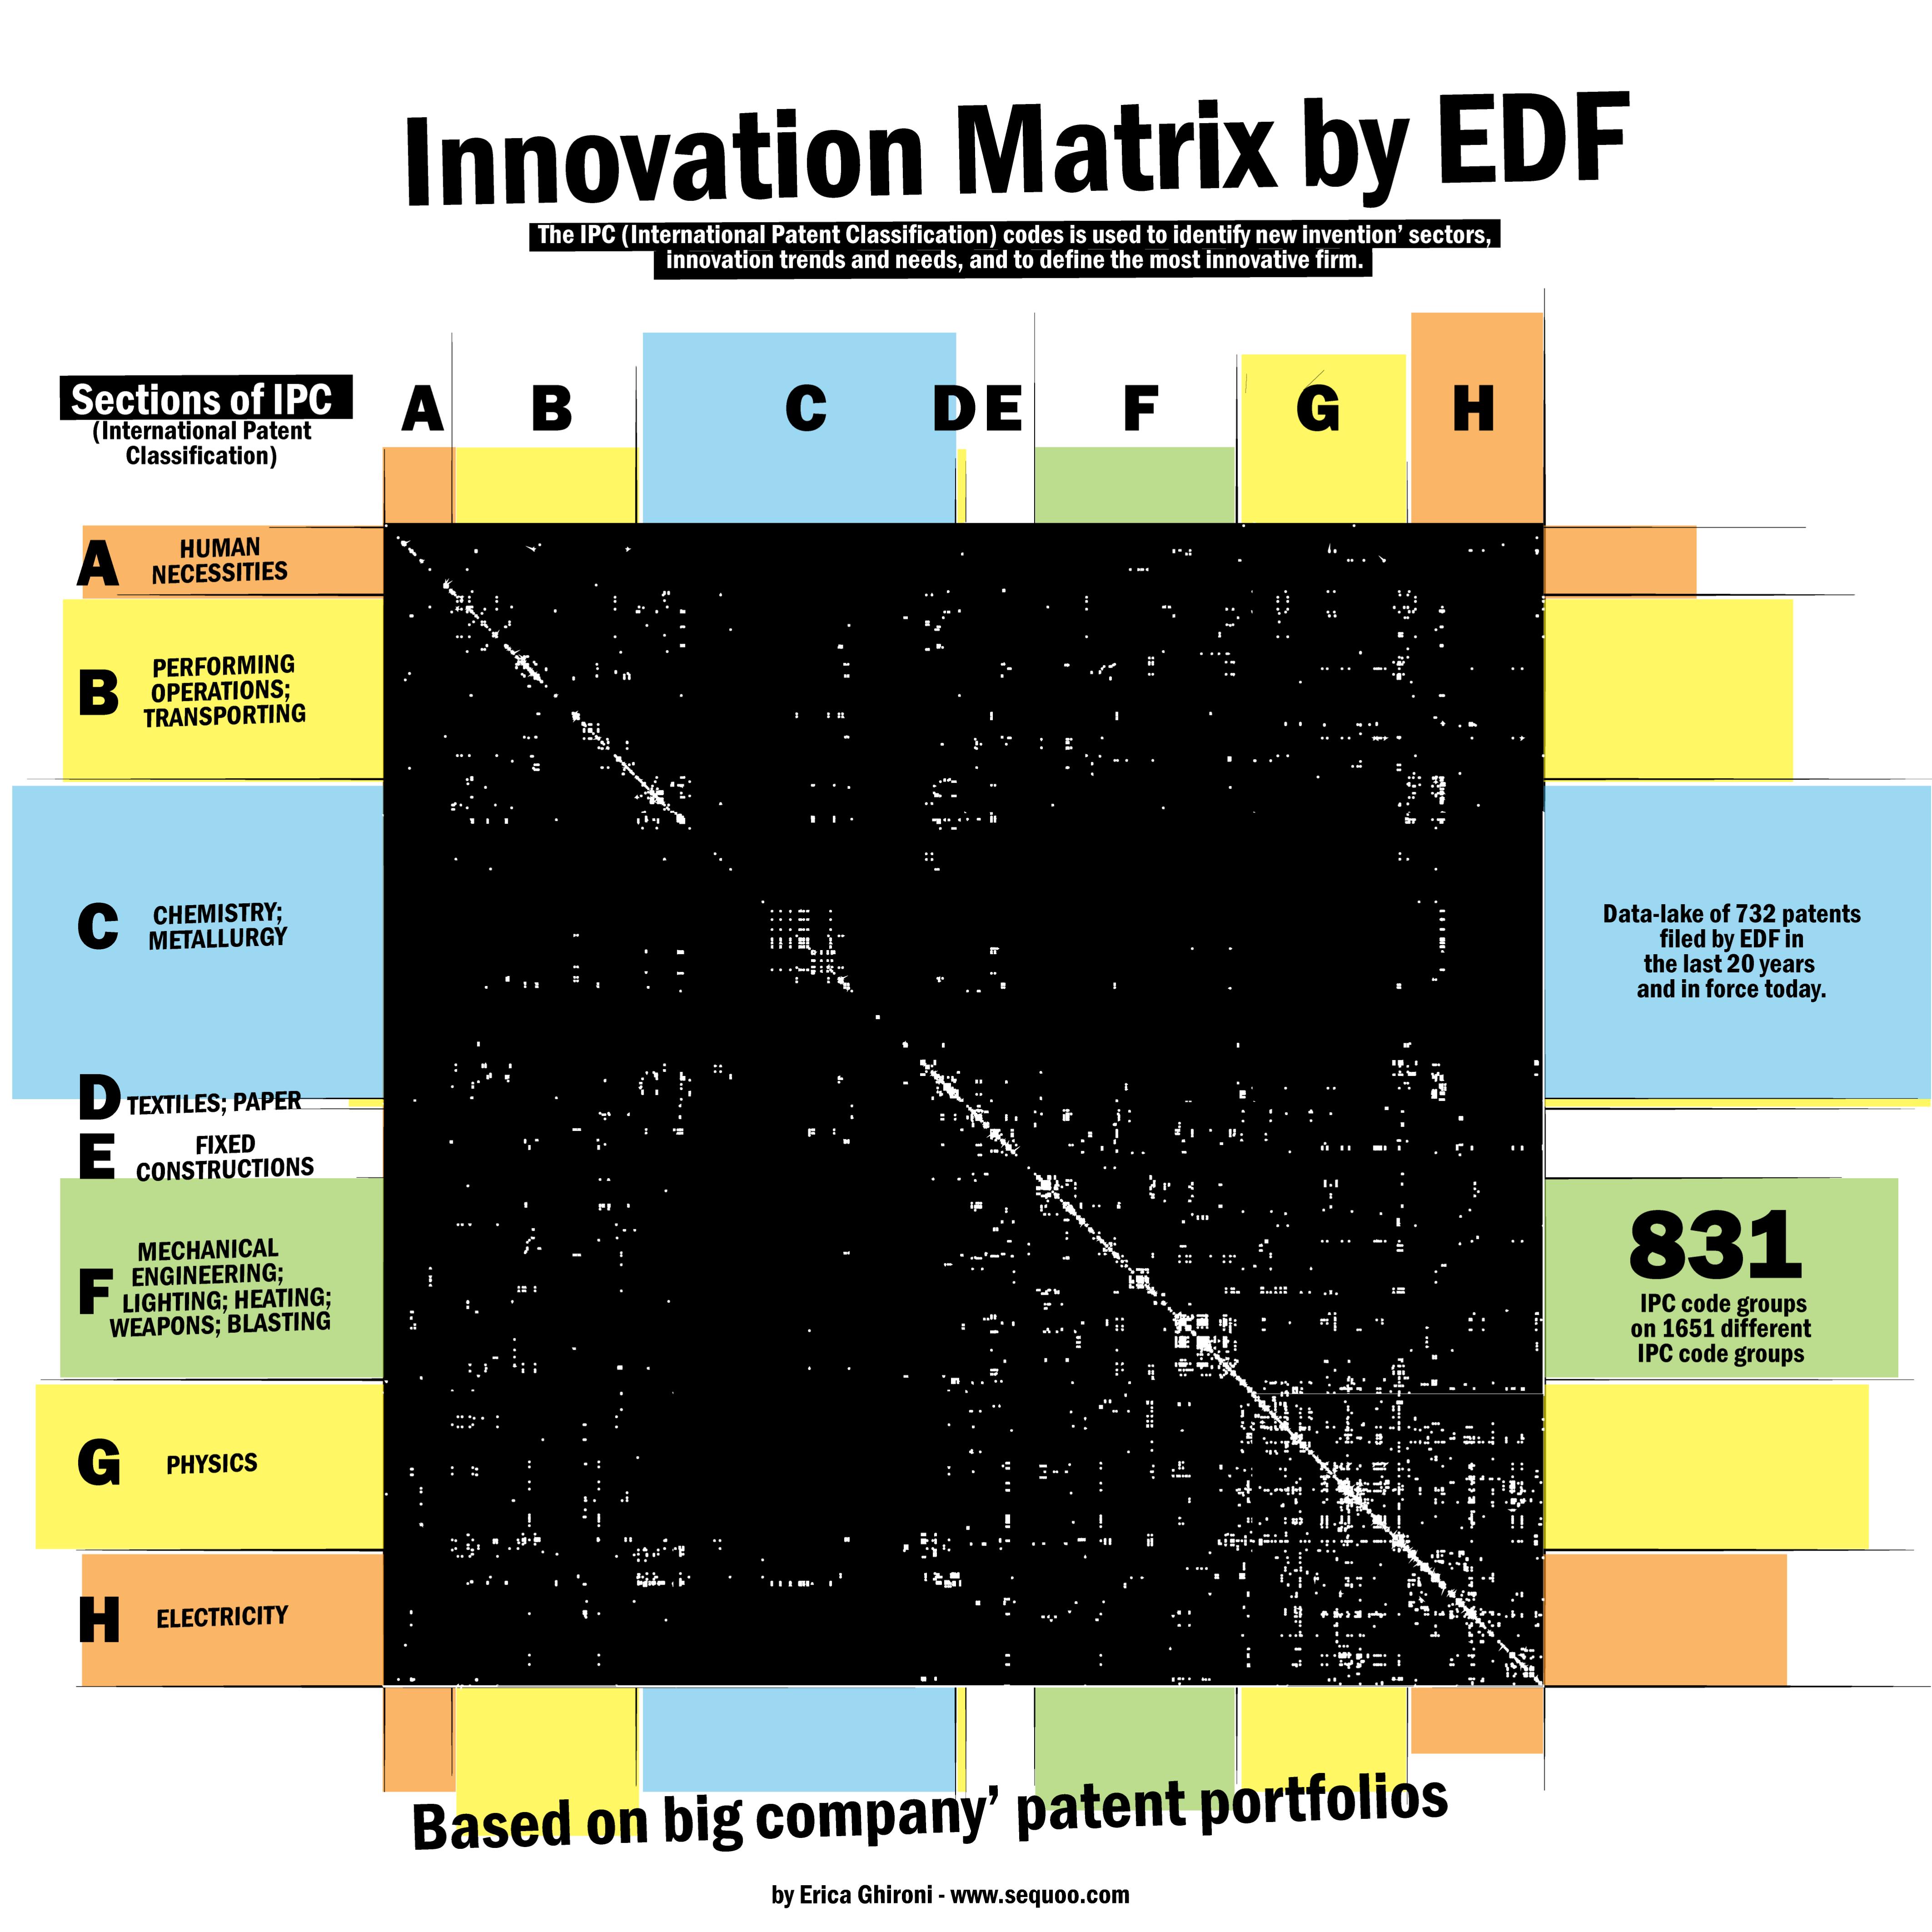 patent portfolio by EDF